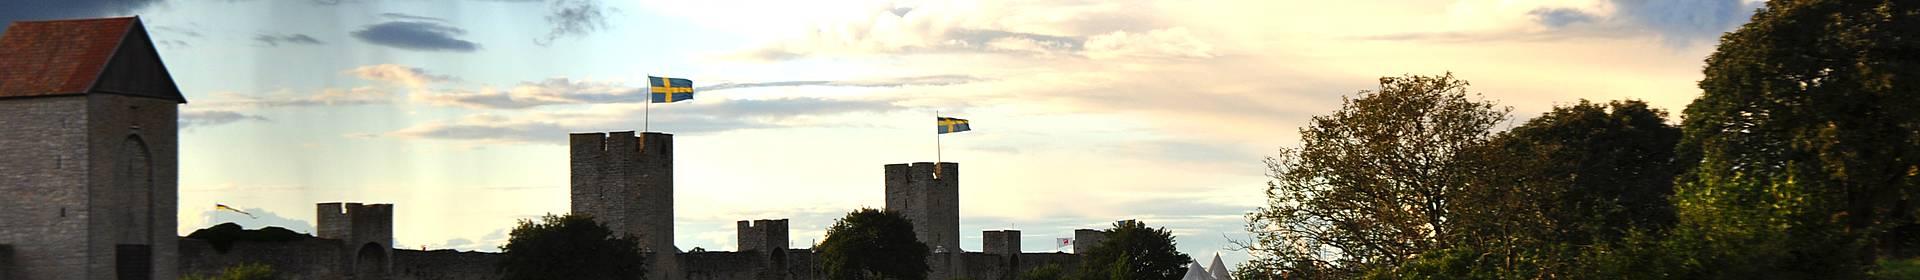 île de Gotland